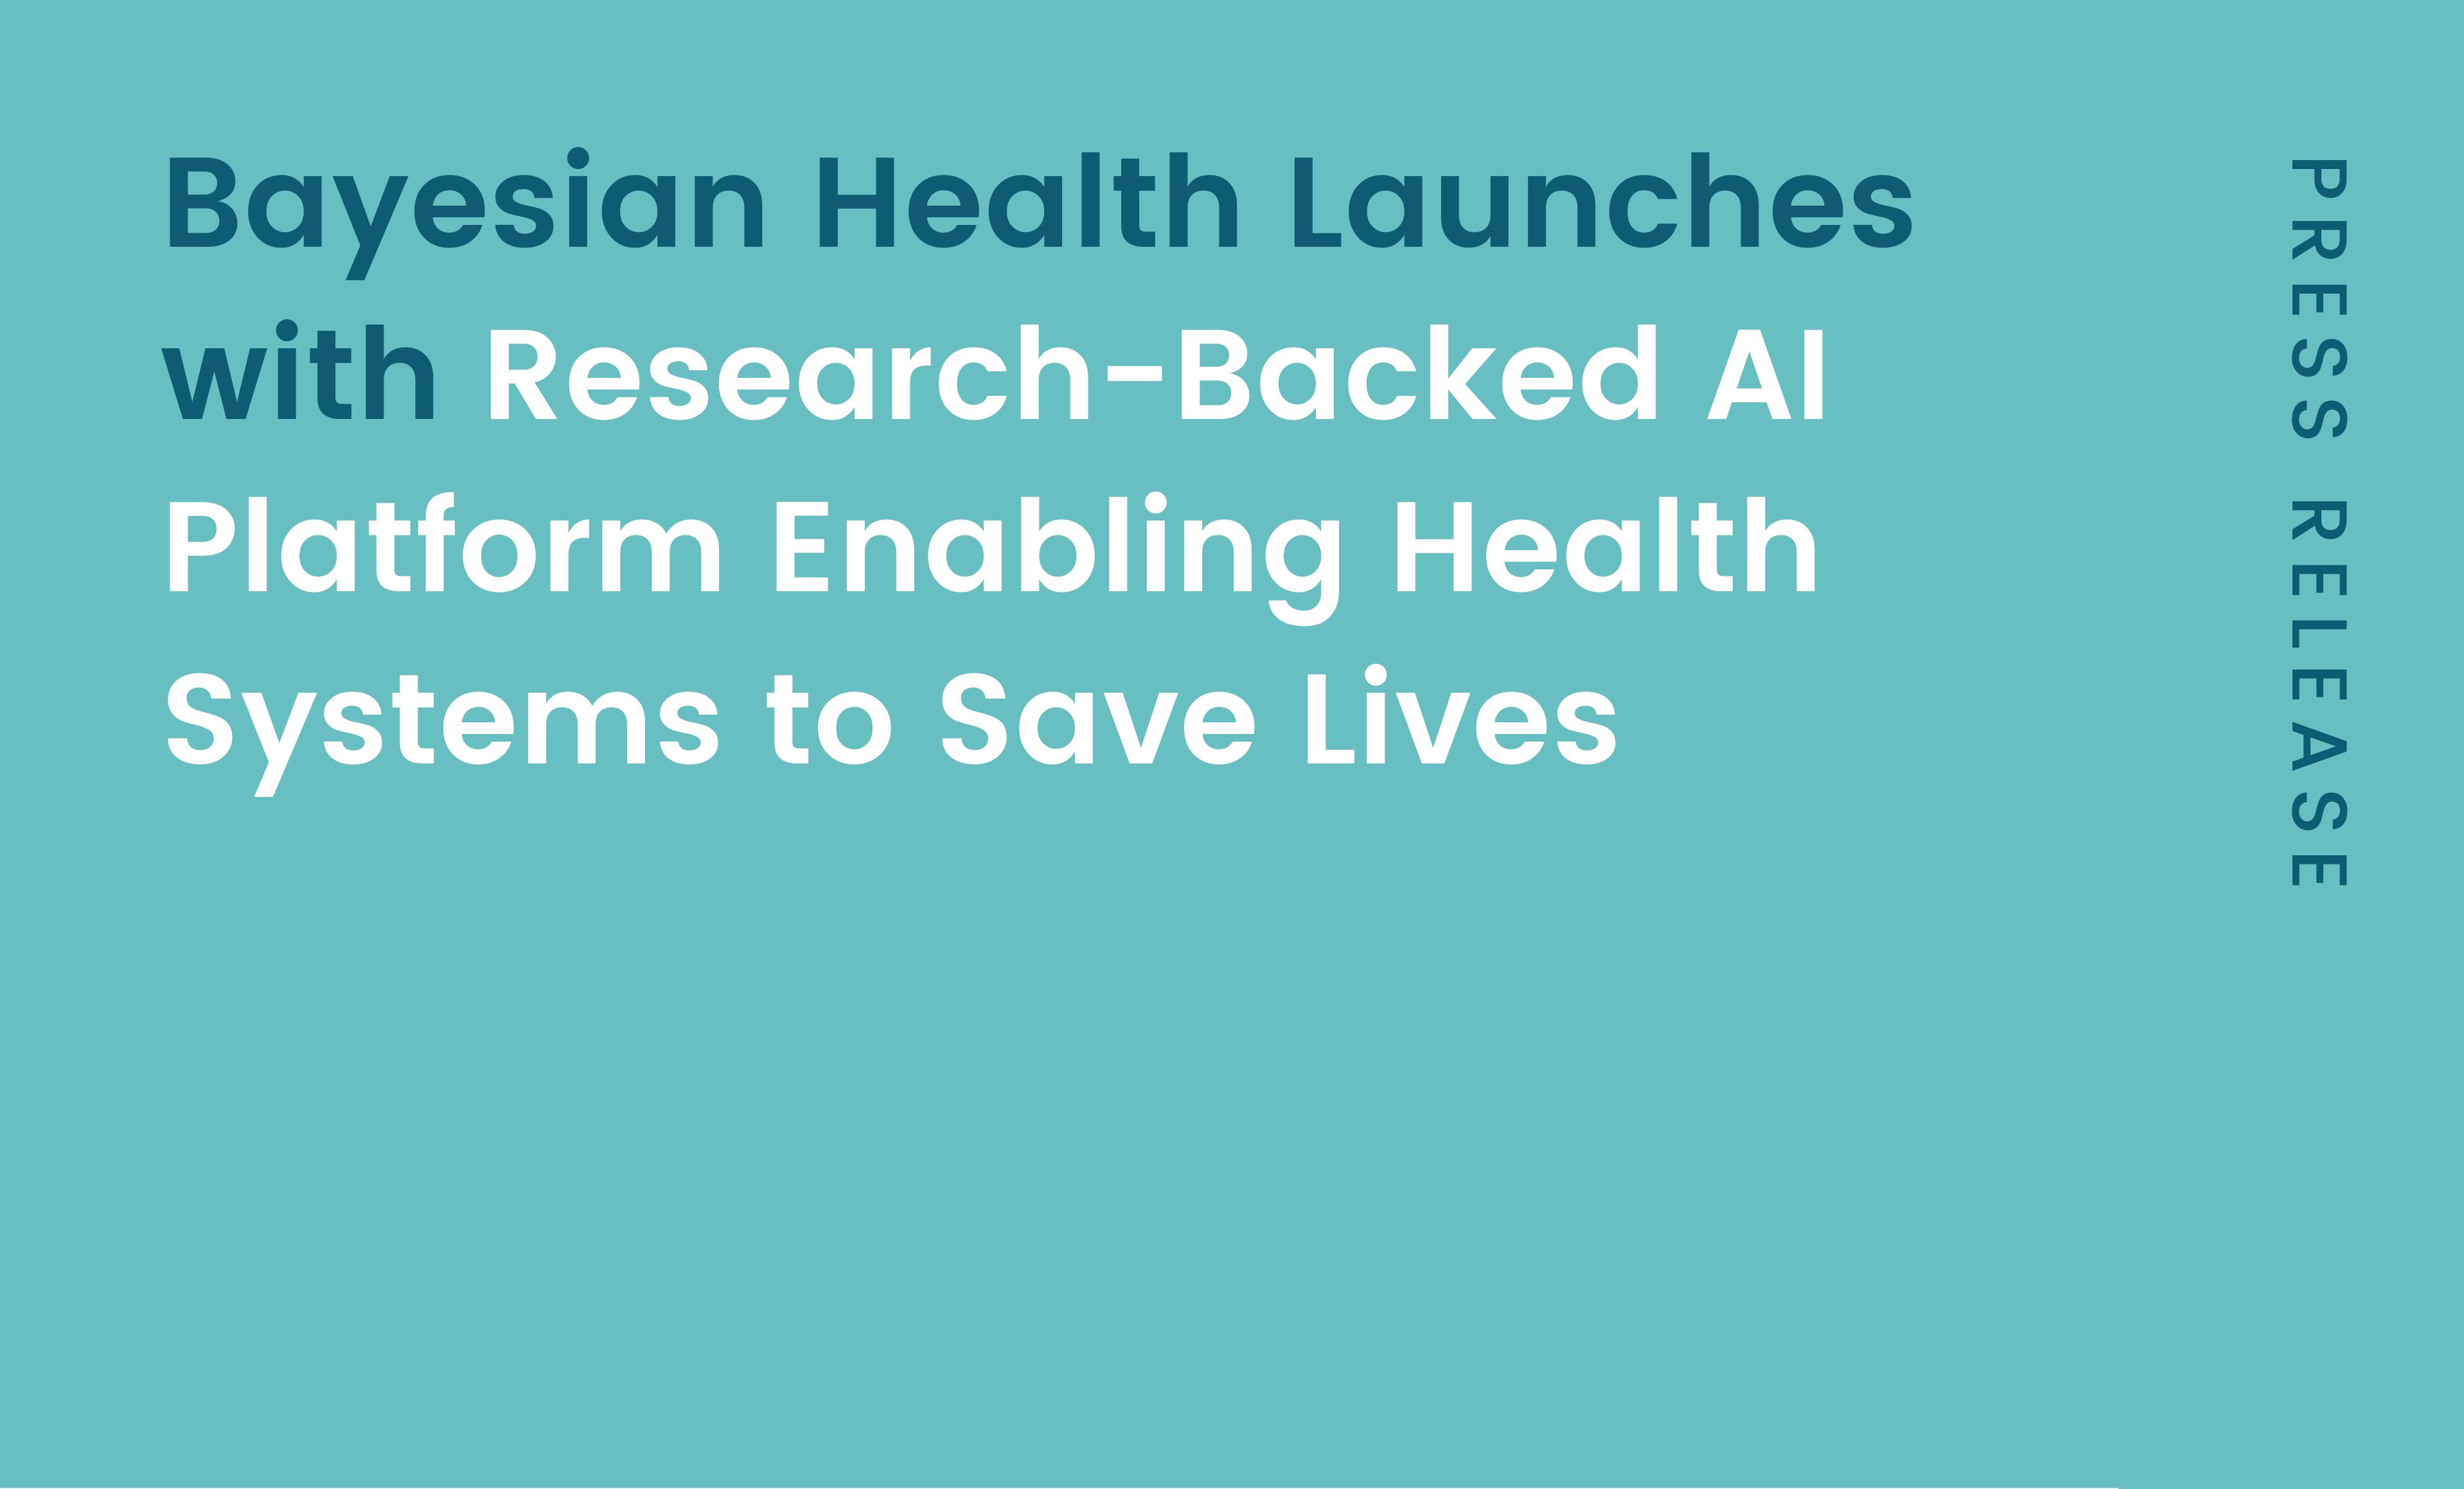 Bayesian Health Launches